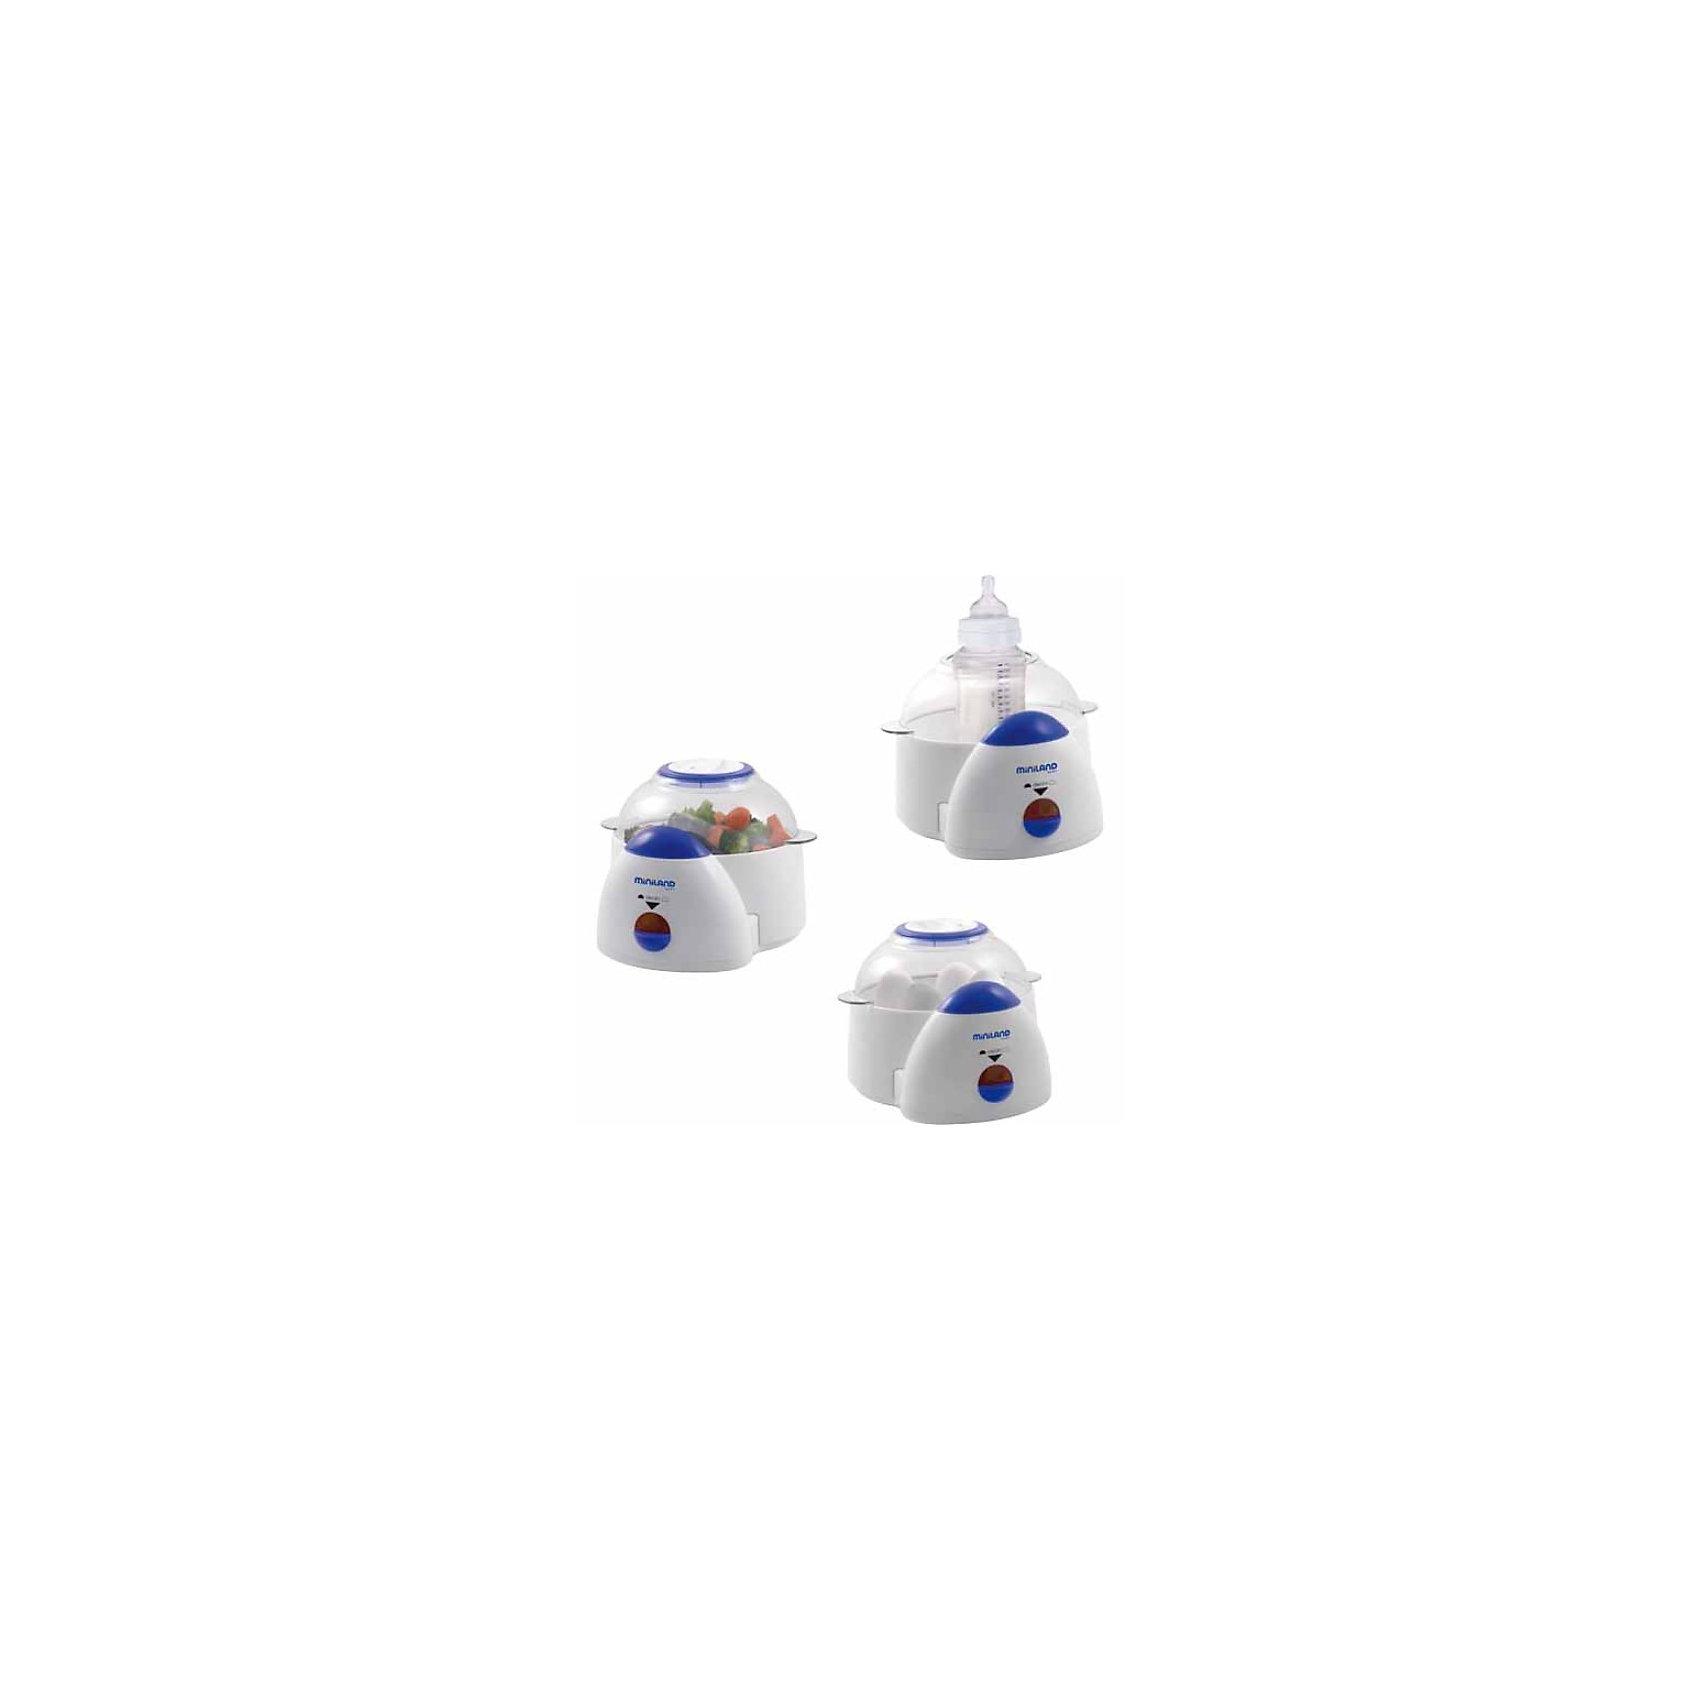 Нагреватель/стерилизатор Super 3 Deco, Miniland от myToys